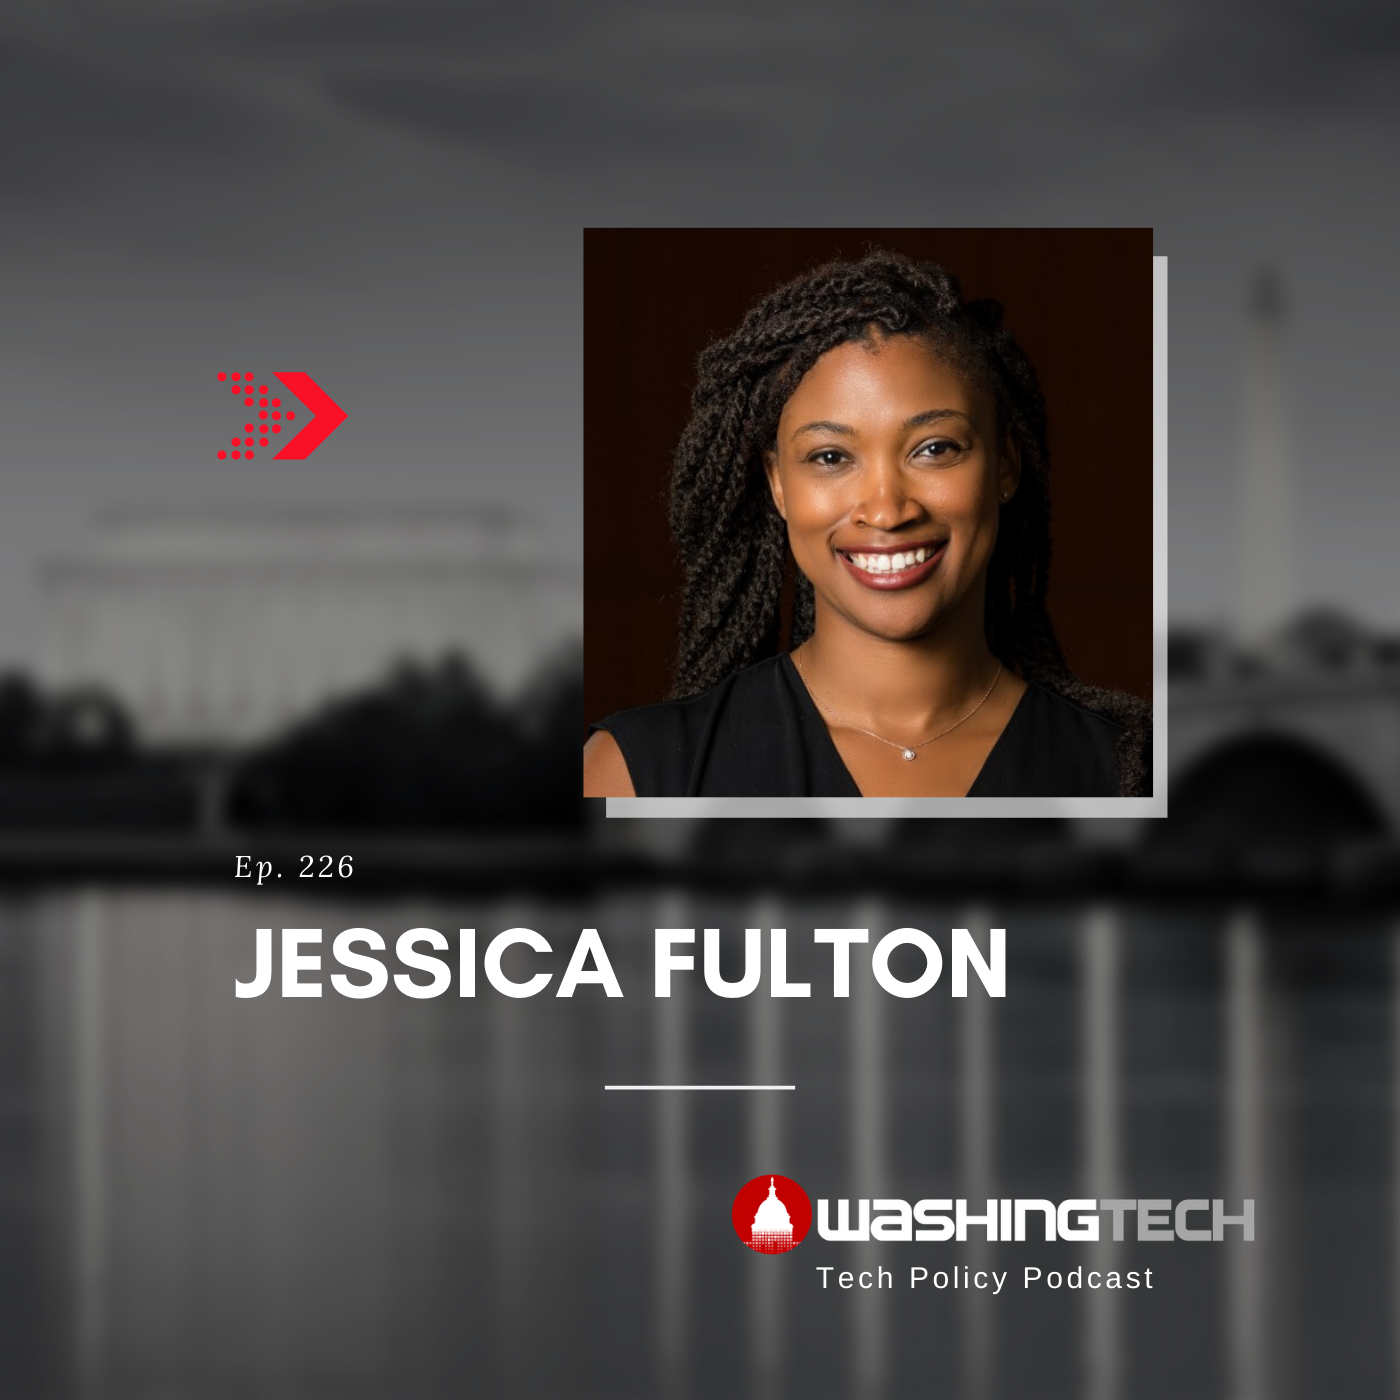 Jessica Fulton